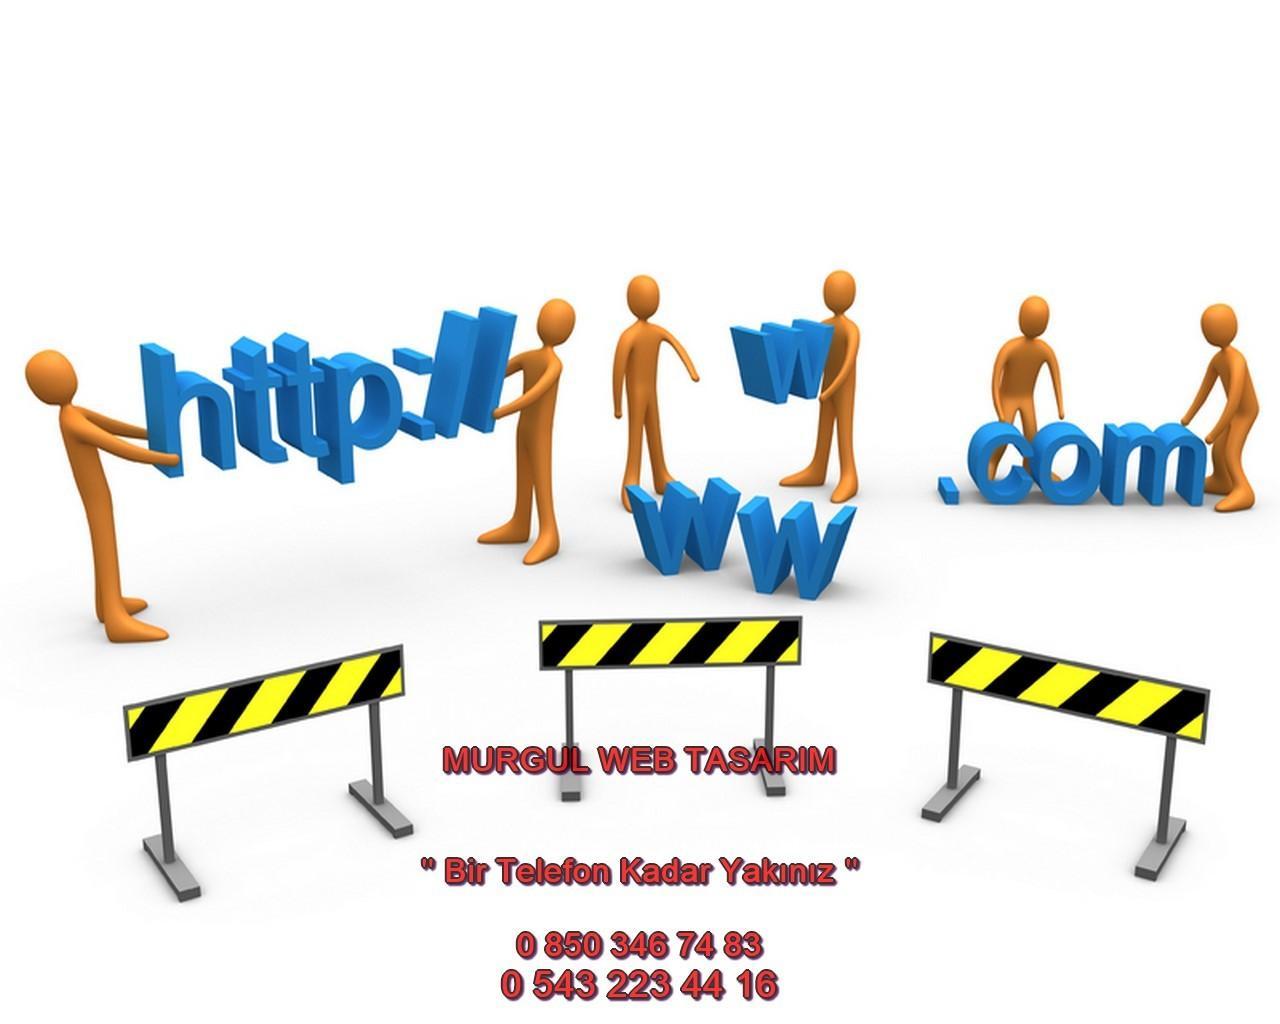 Murgul Web Tasarım